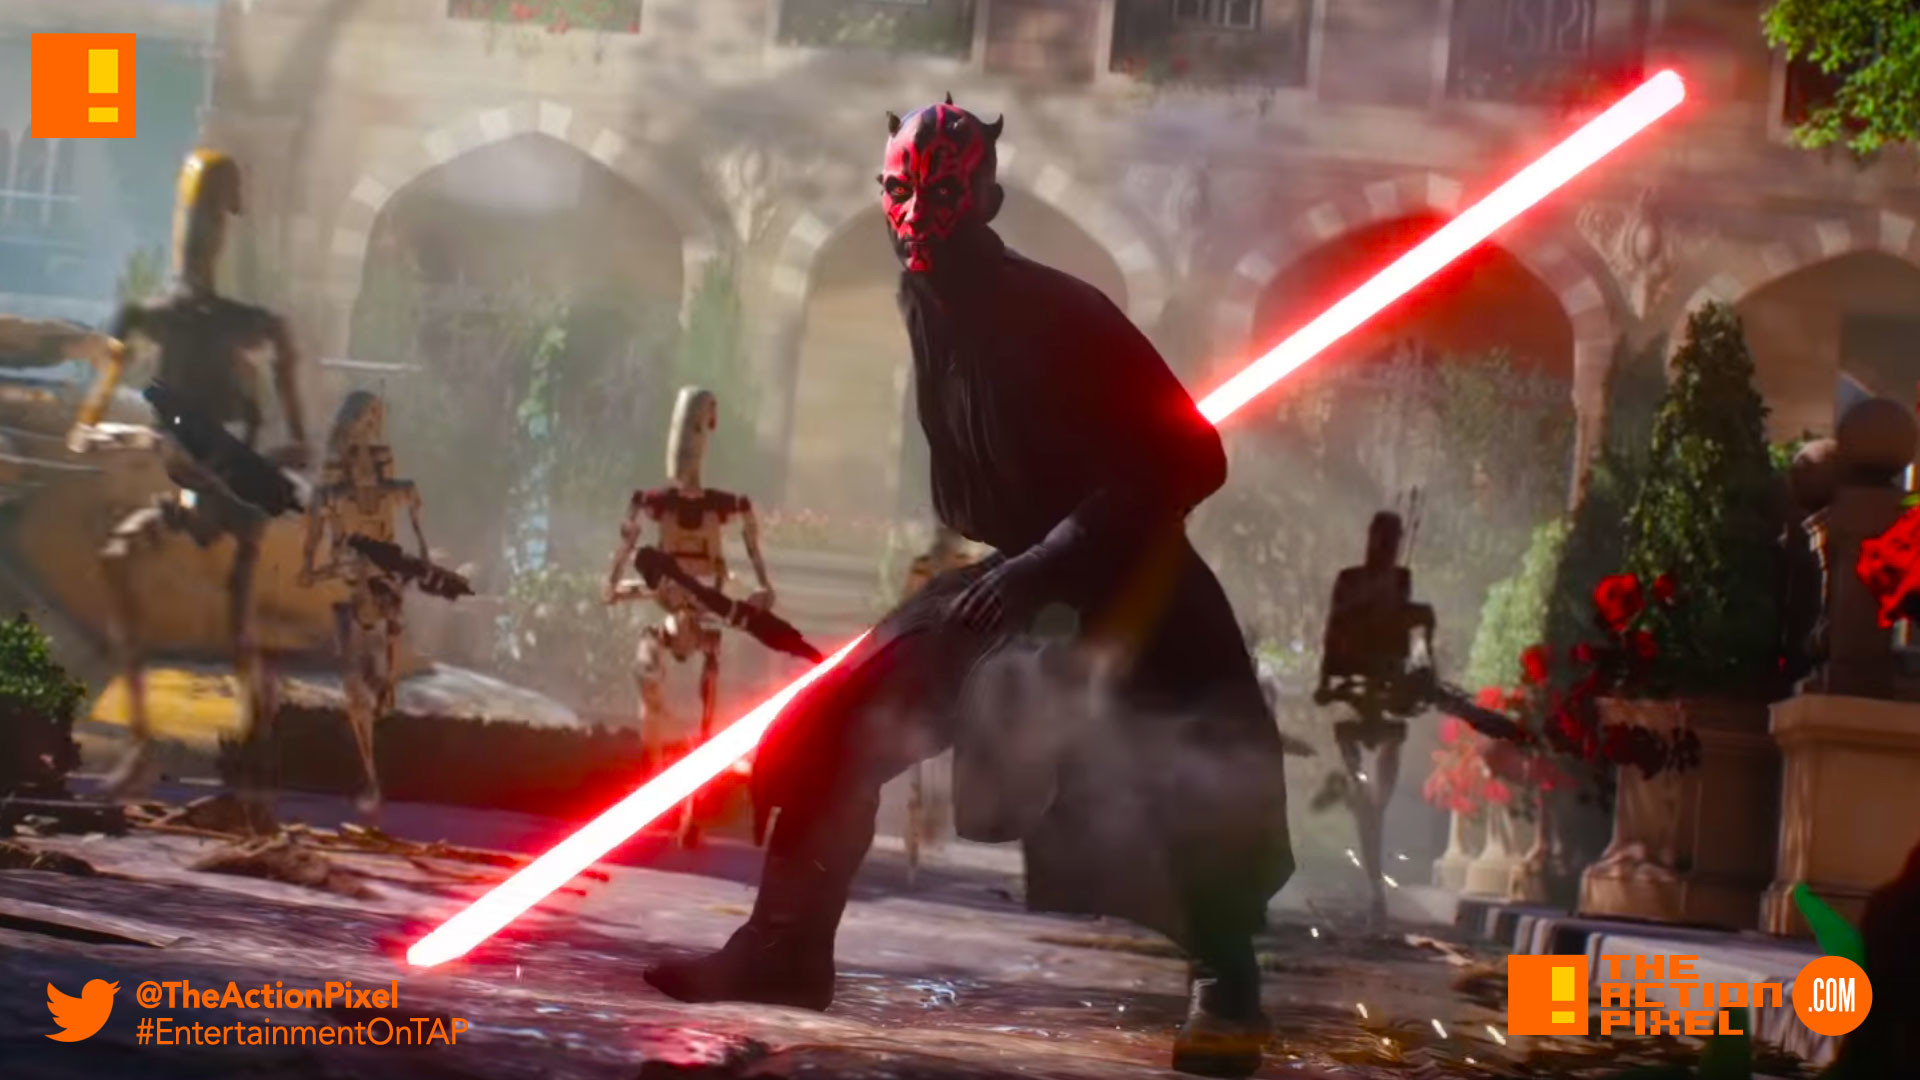 darth maul, battlefront II, star wars battlefront II,star wars  battlefront,star